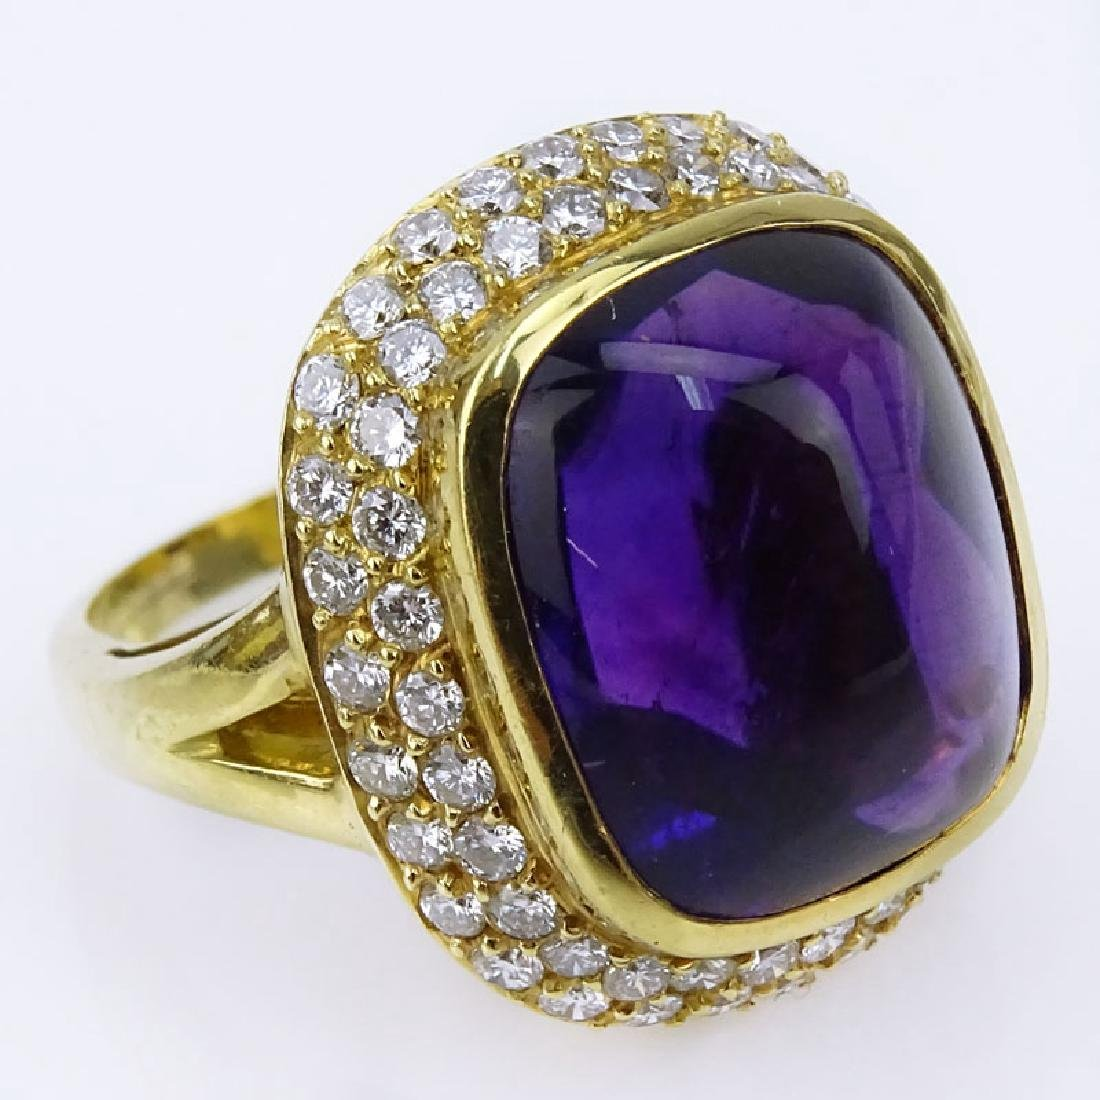 H Stern Sugarloaf Cabochon Amethyst, Pave Set Diamond